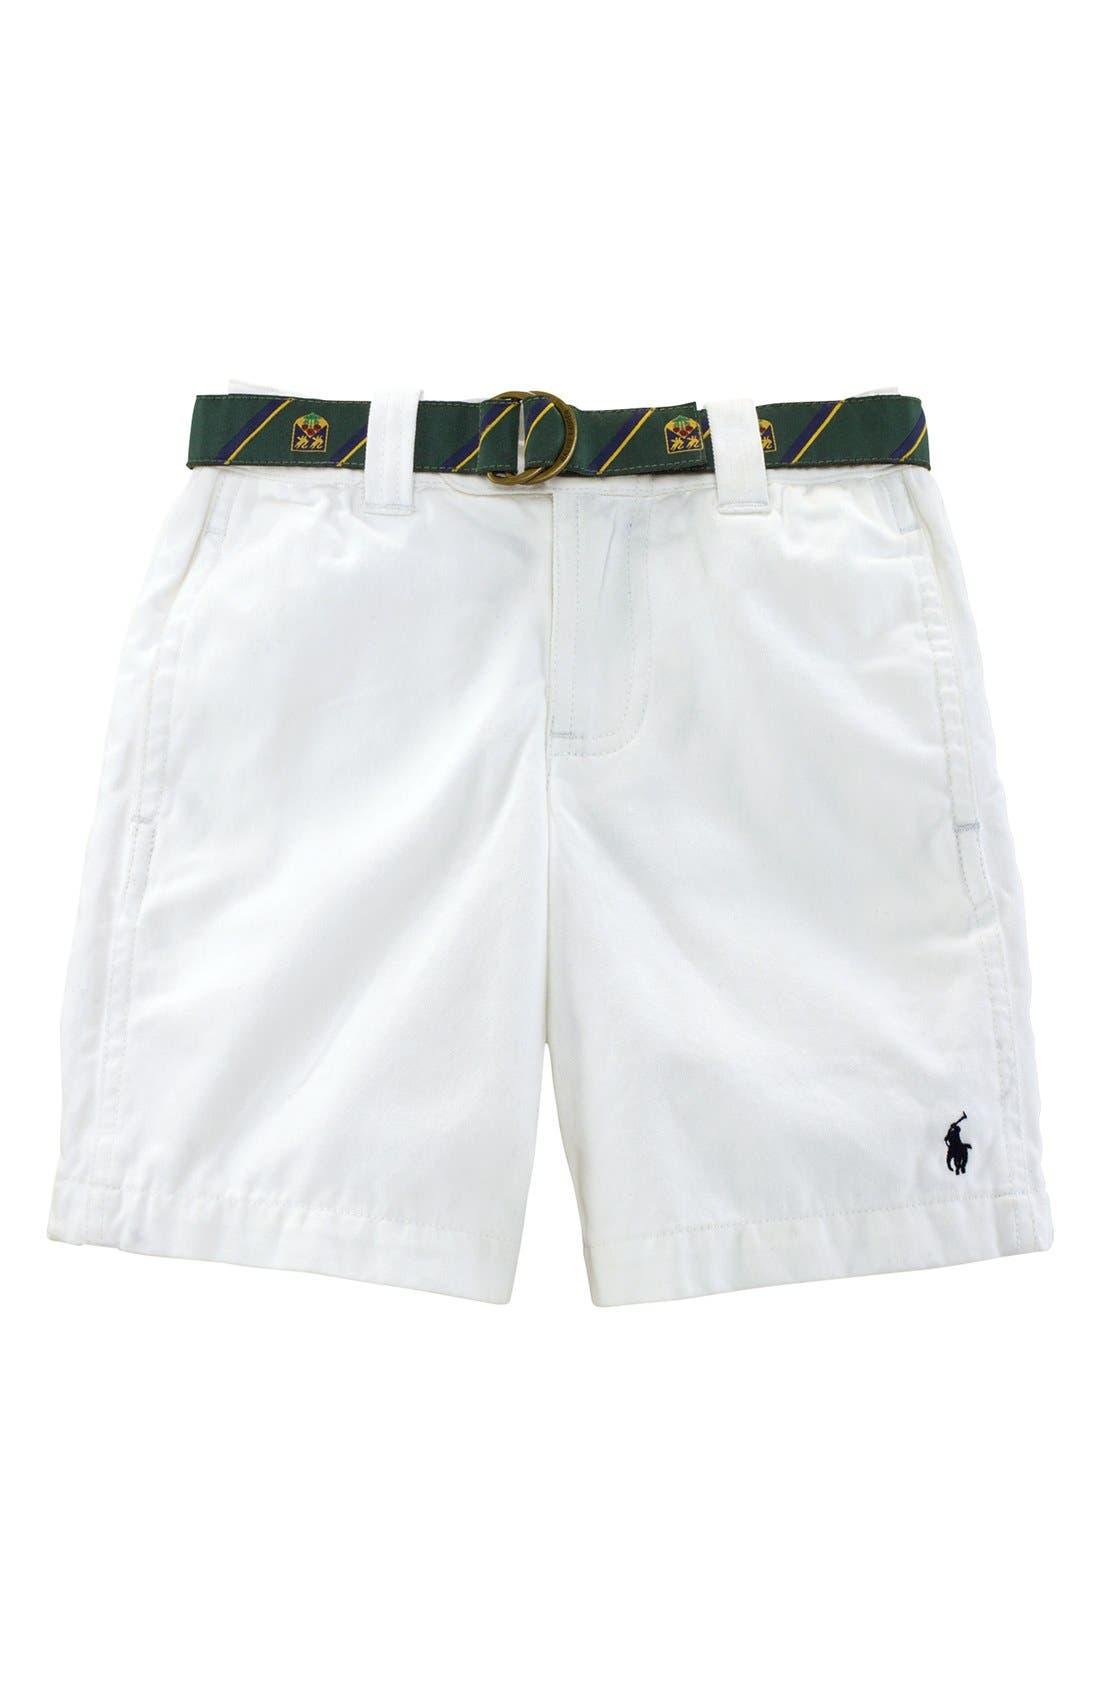 Alternate Image 1 Selected - Ralph Lauren Shorts (Toddler Boys)